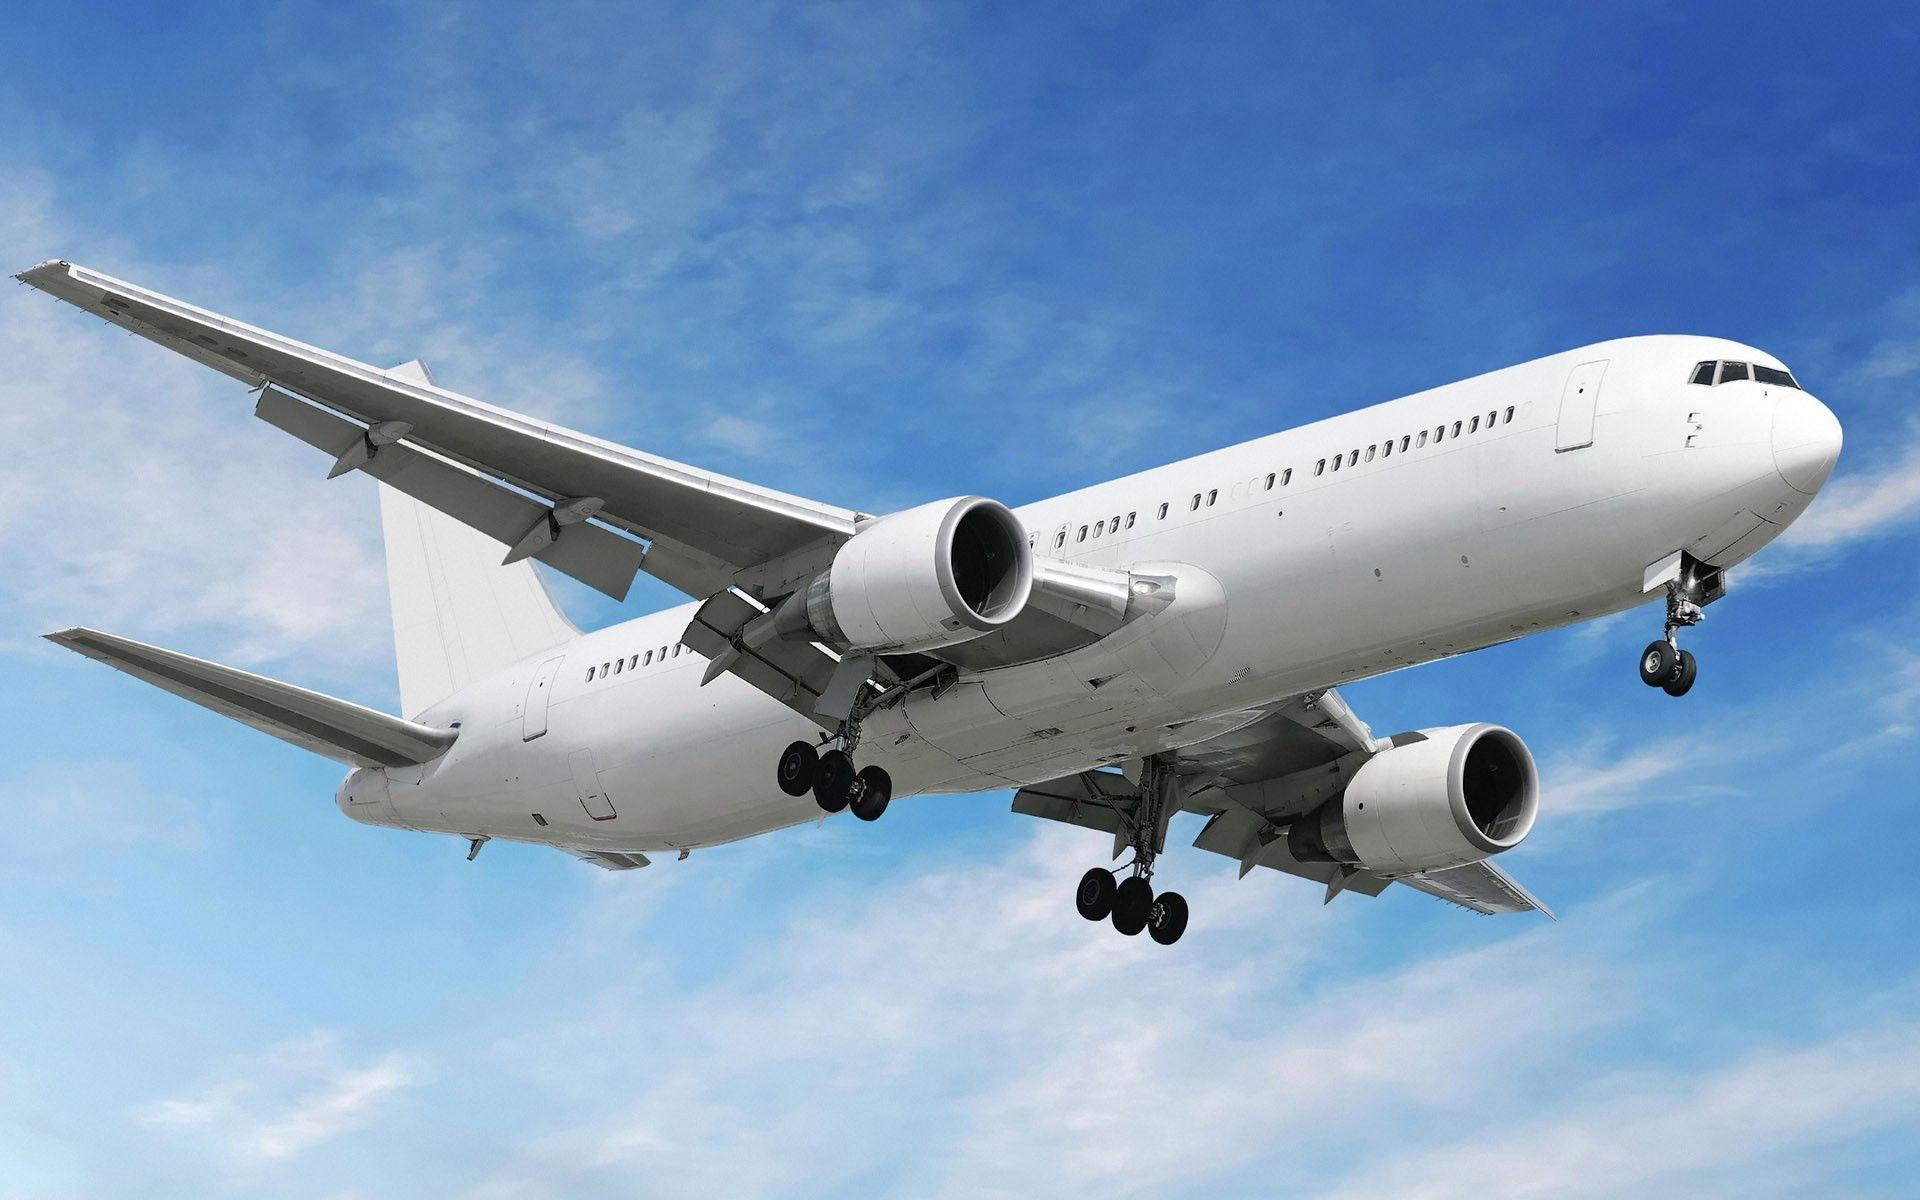 airplane HD Wallpapers Download Free airplane Tumblr